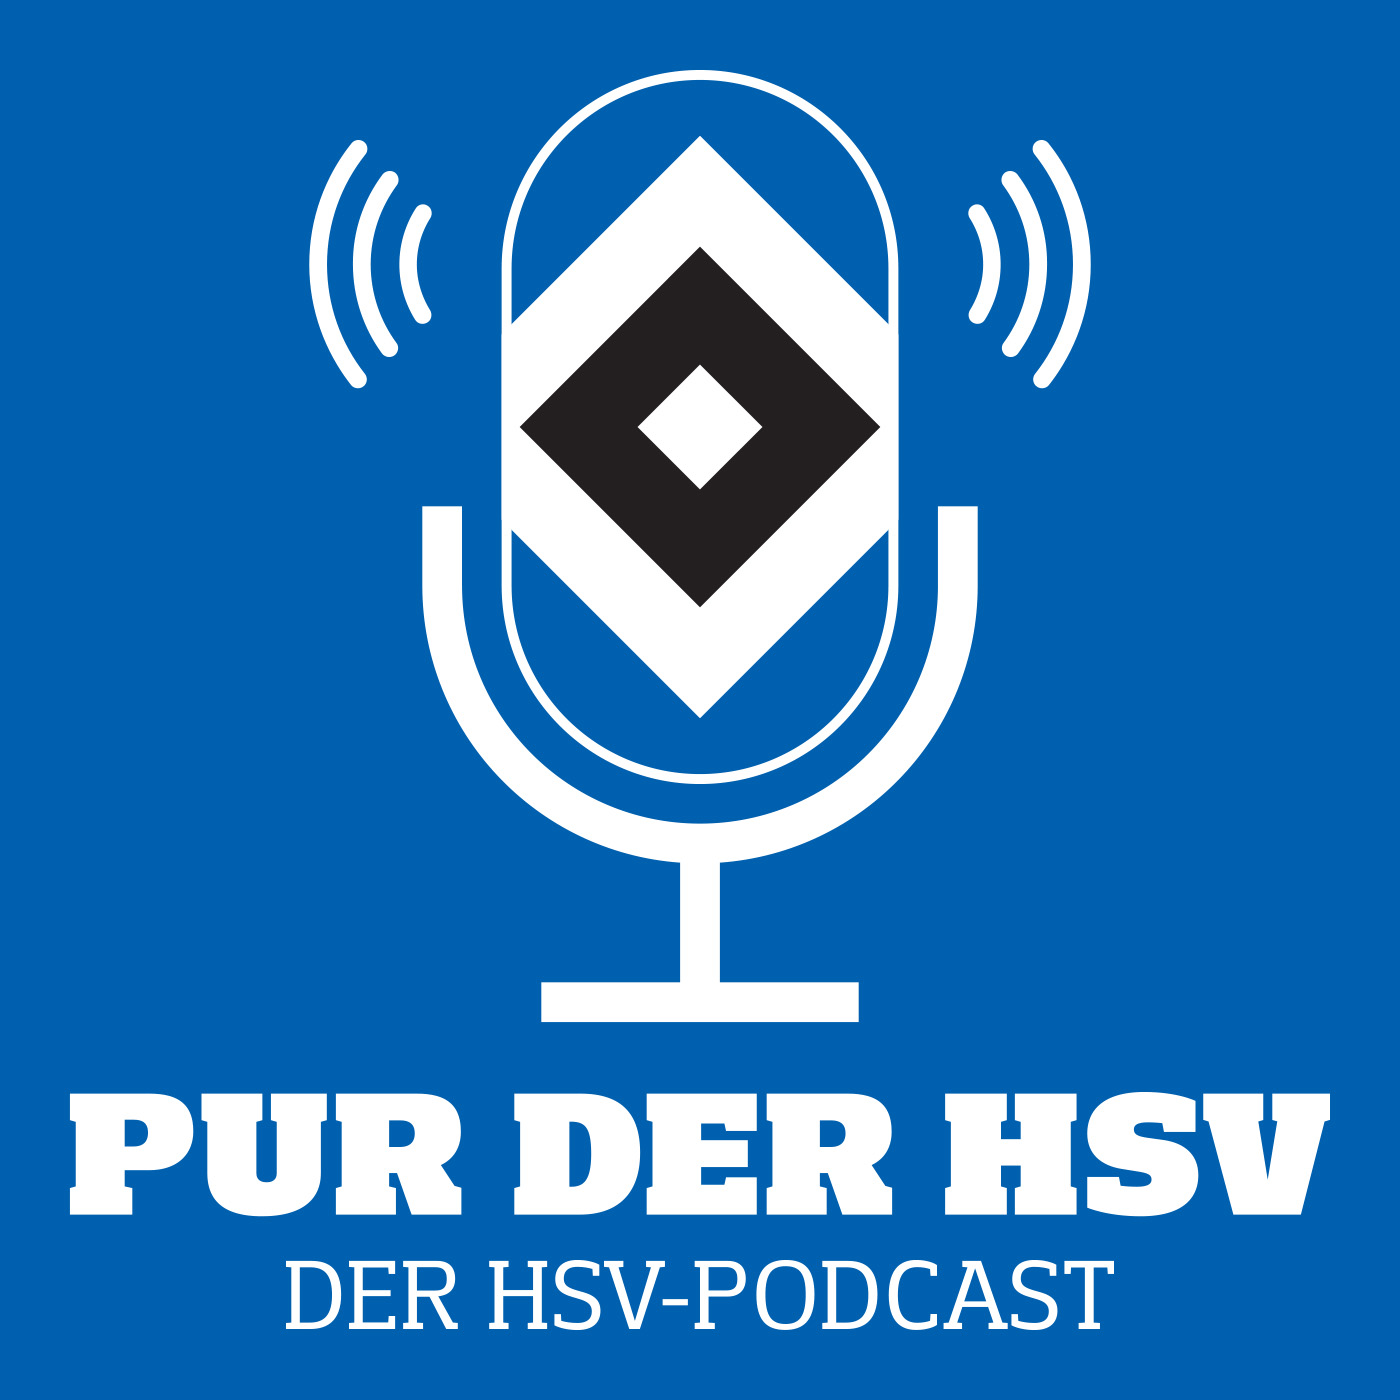 PUR DER HSV - der HSV-Podcast | #11 | KHALED NAREY